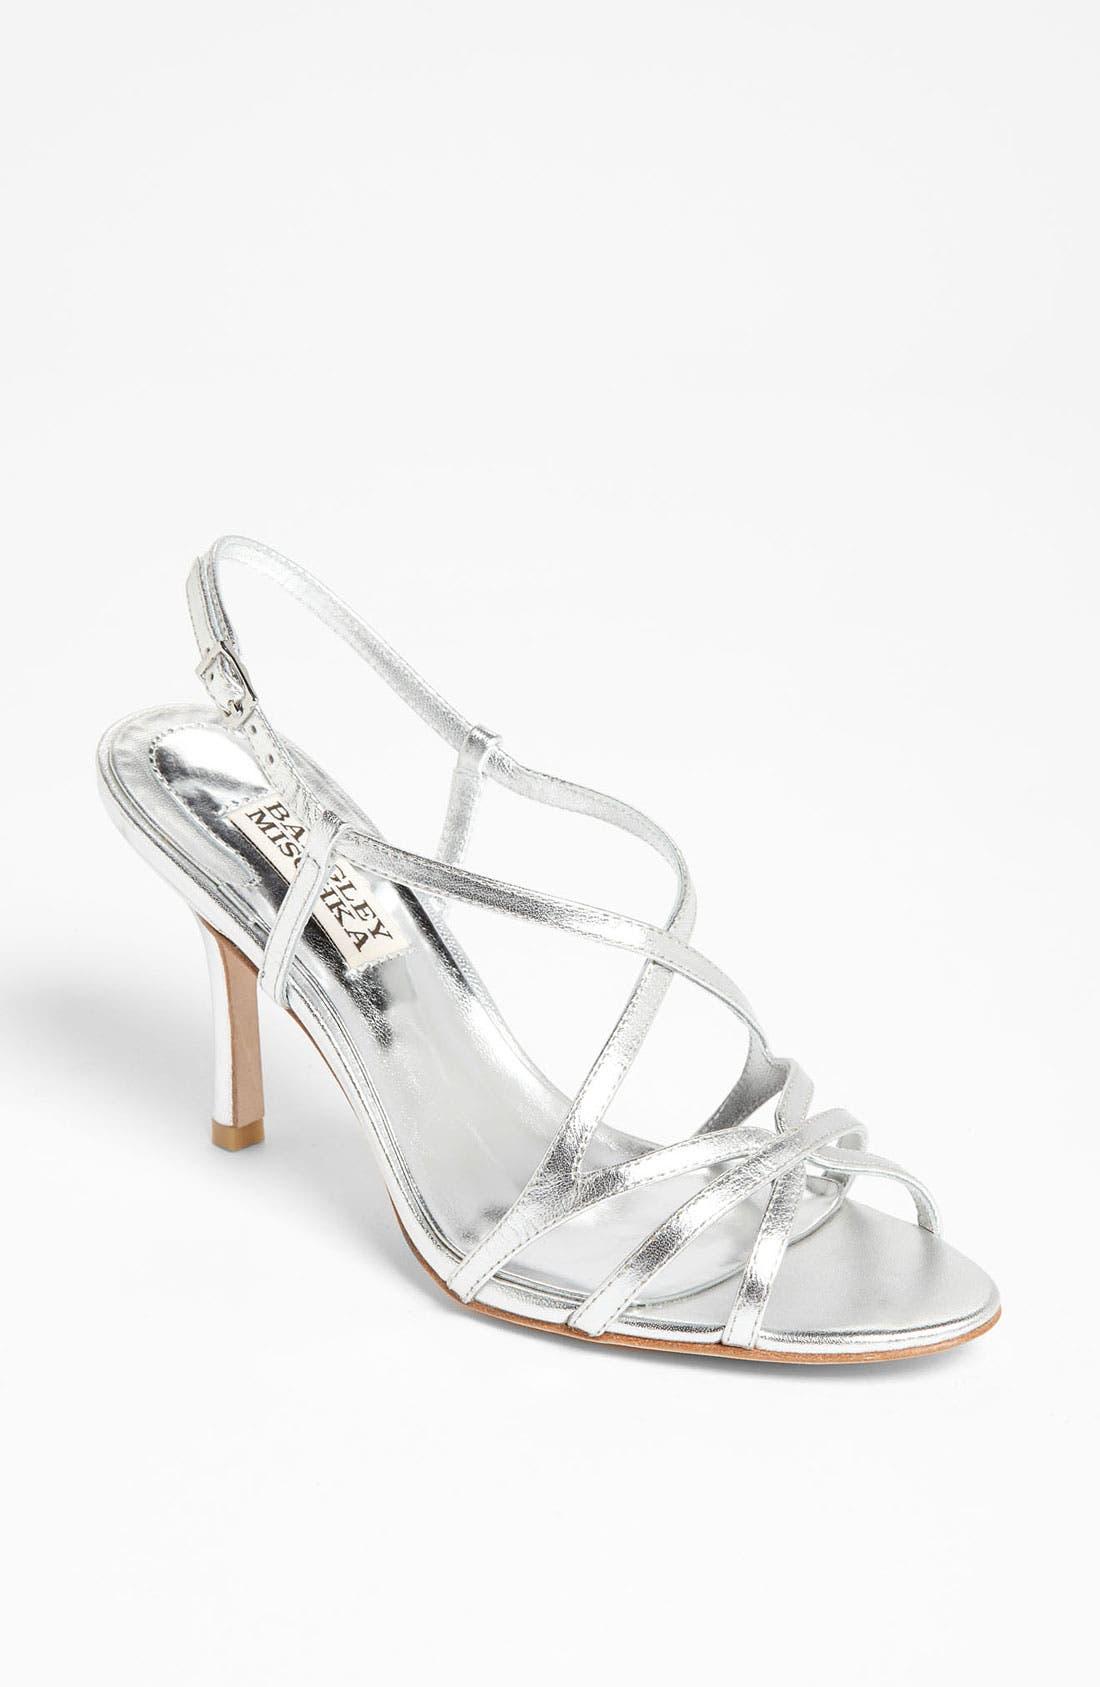 Main Image - Badgley Mischka 'Ava II' Sandal